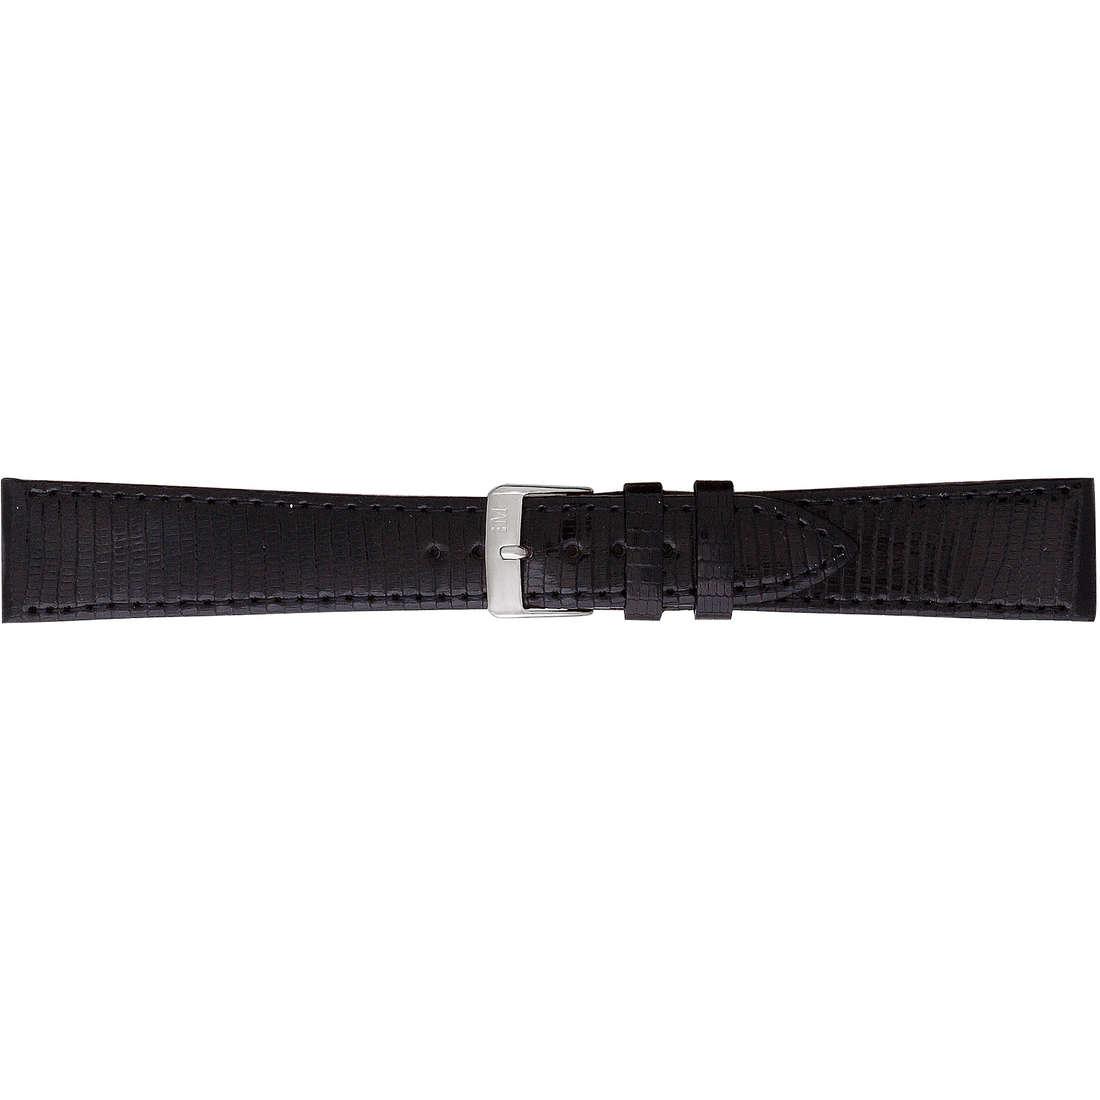 watch watch bands watch straps man Morellato Pelli Preziose A01U0858040019CR20